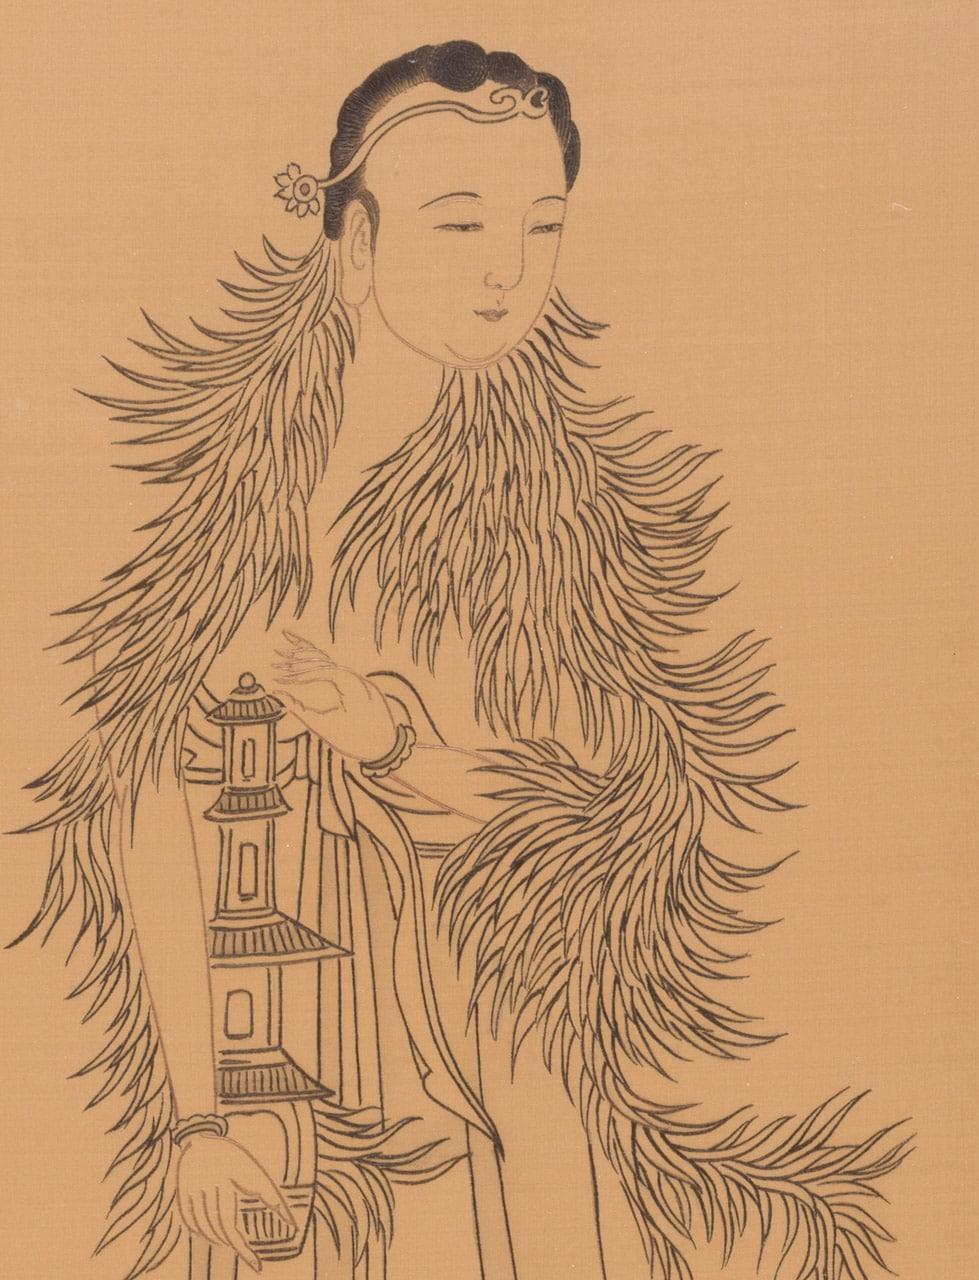 The Guiding Lantern (detail)